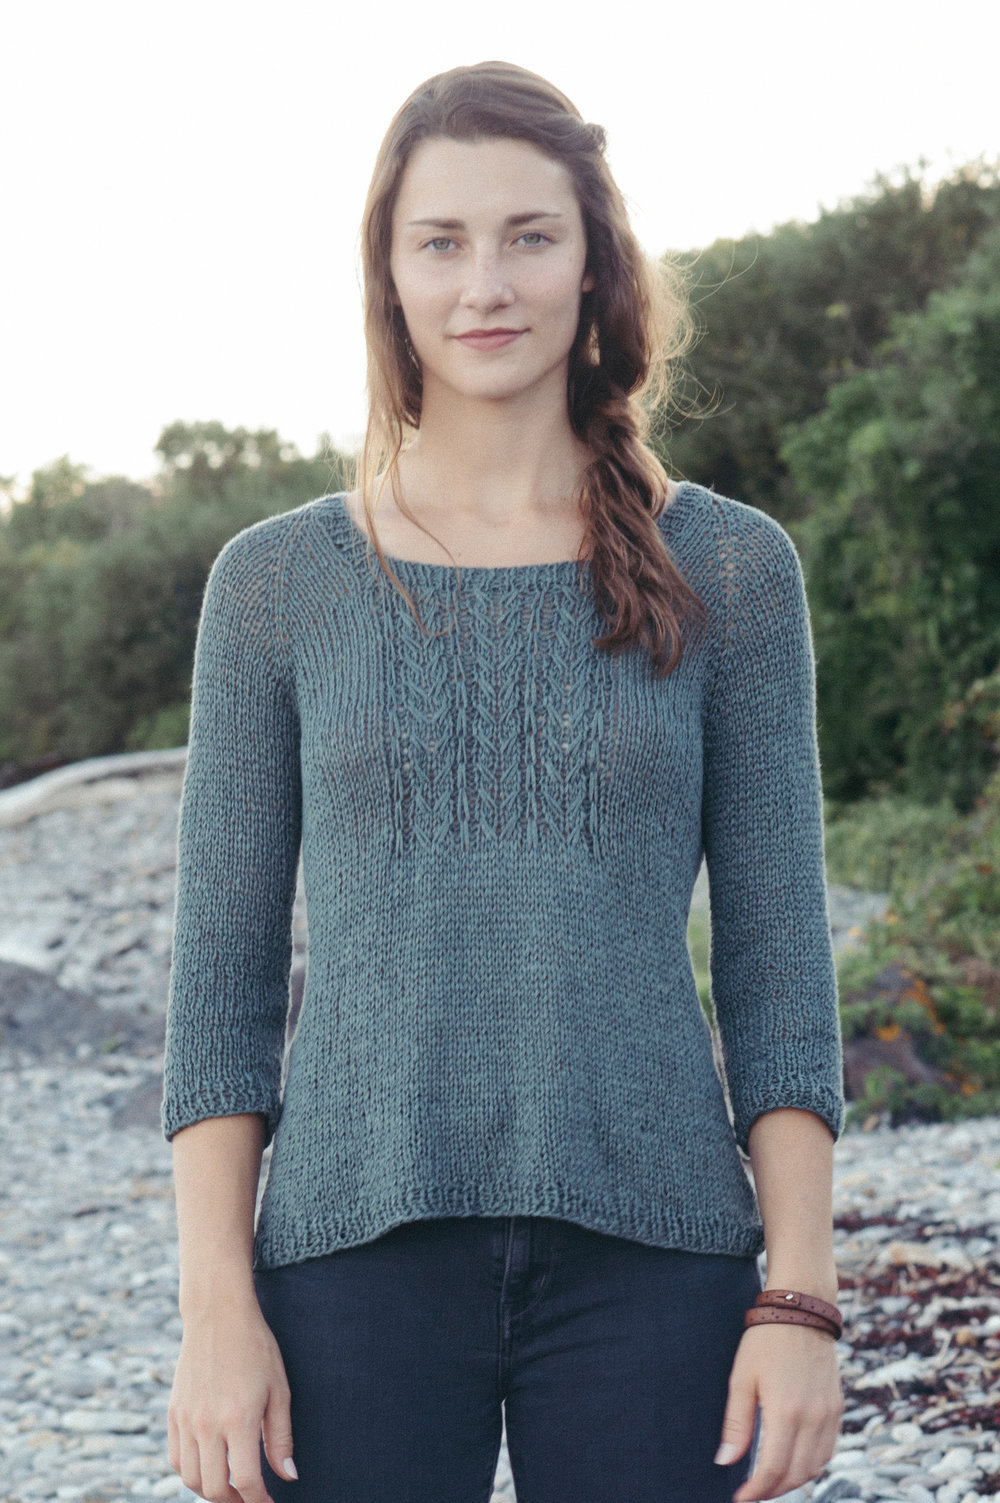 quince-co-merrifield-pam-allen-knitting-pattern-kestrel-1.jpg